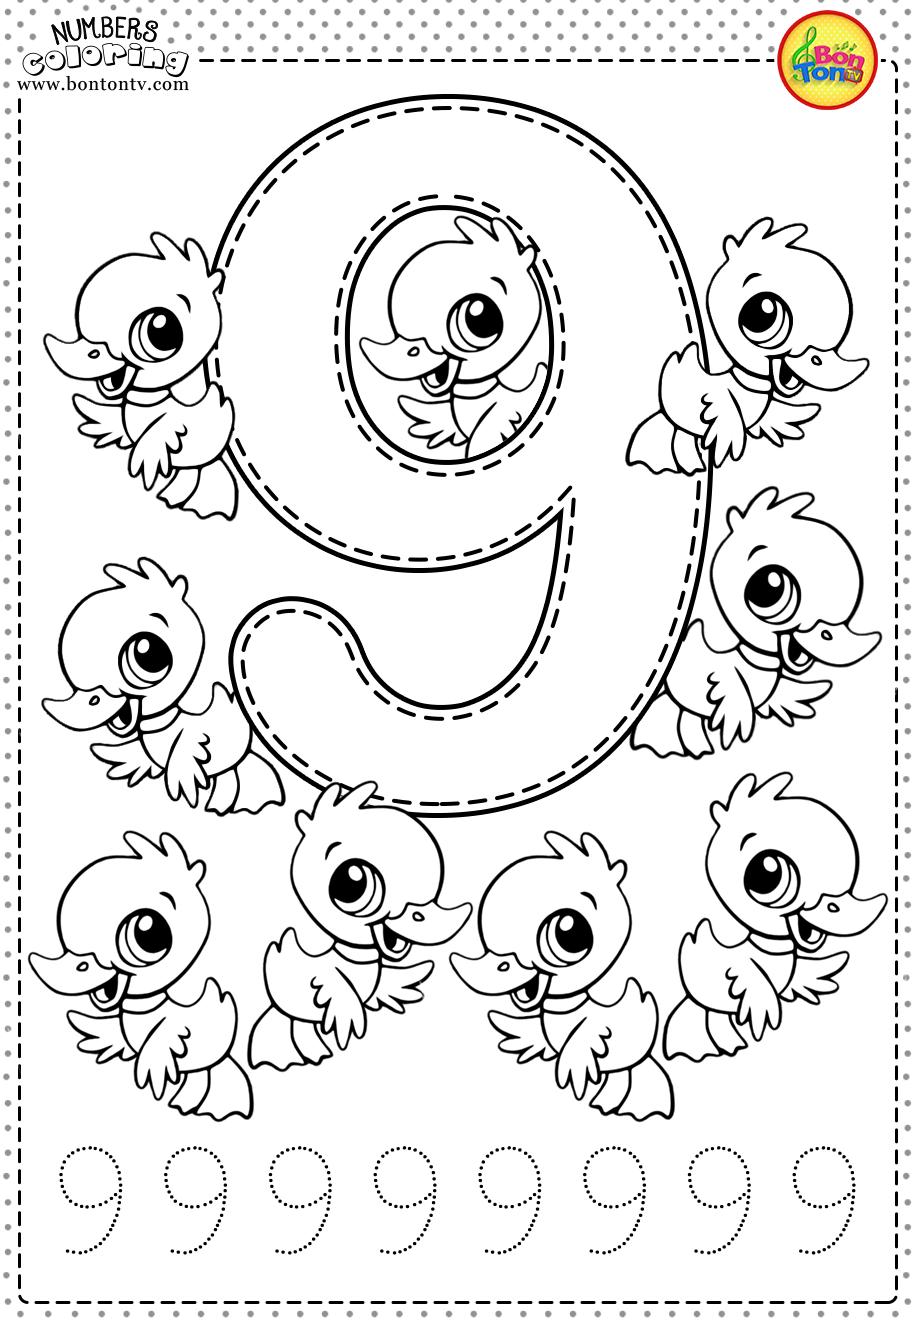 Number 9 Preschool Printables Free Worksheets And Coloring Pages For Kids Learning Numbers Counting 1 10 Broj 9 Bojanke Za Djecu Numeros Preescolar Hojas De Trabajo Preescolar Actividades De Matematicas Preescolares